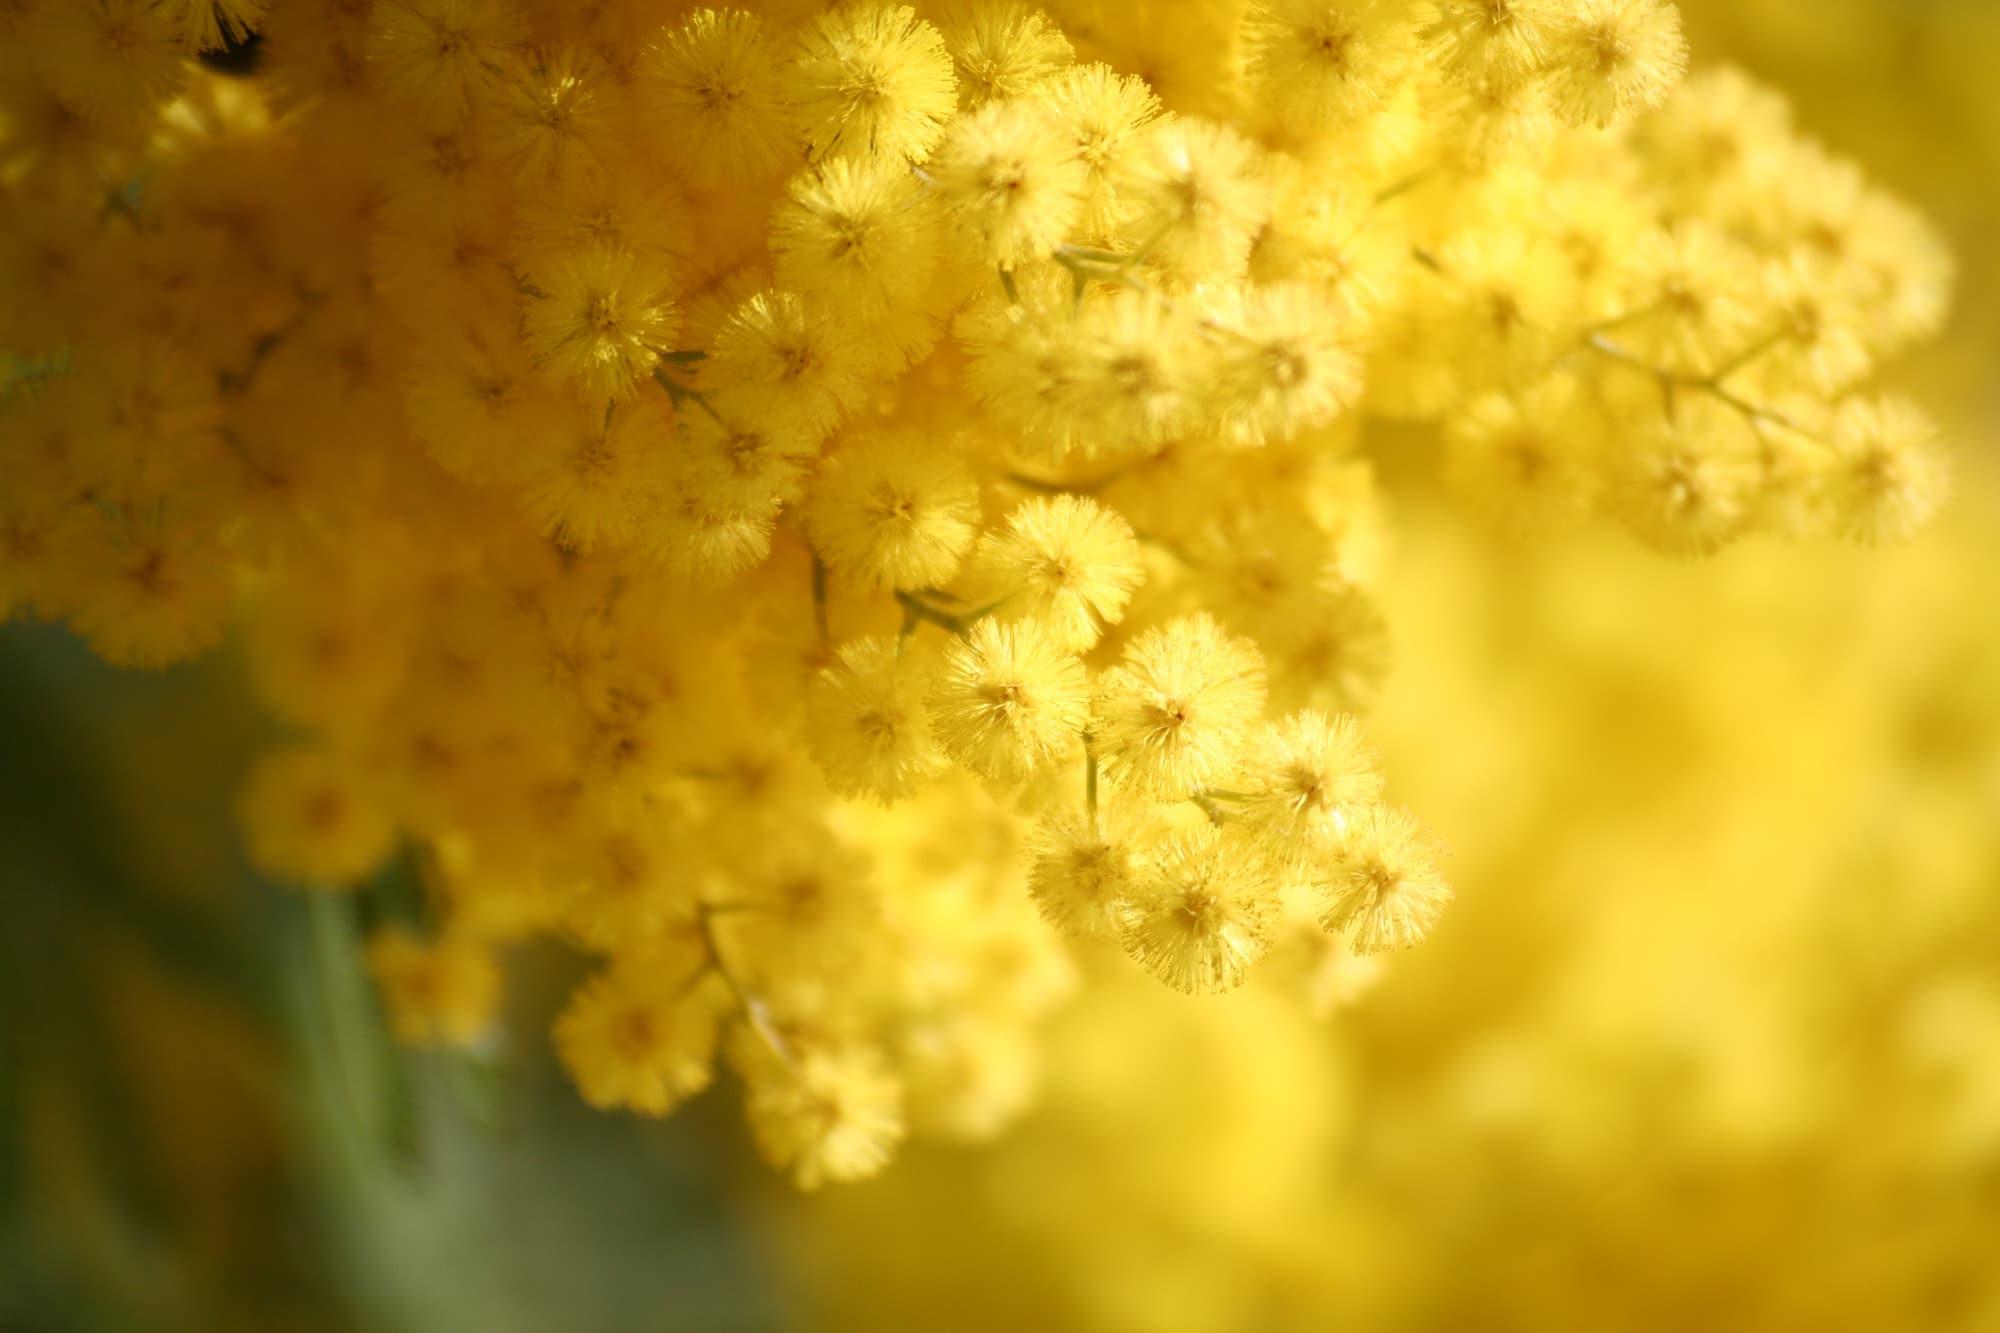 les vertus du mimosa